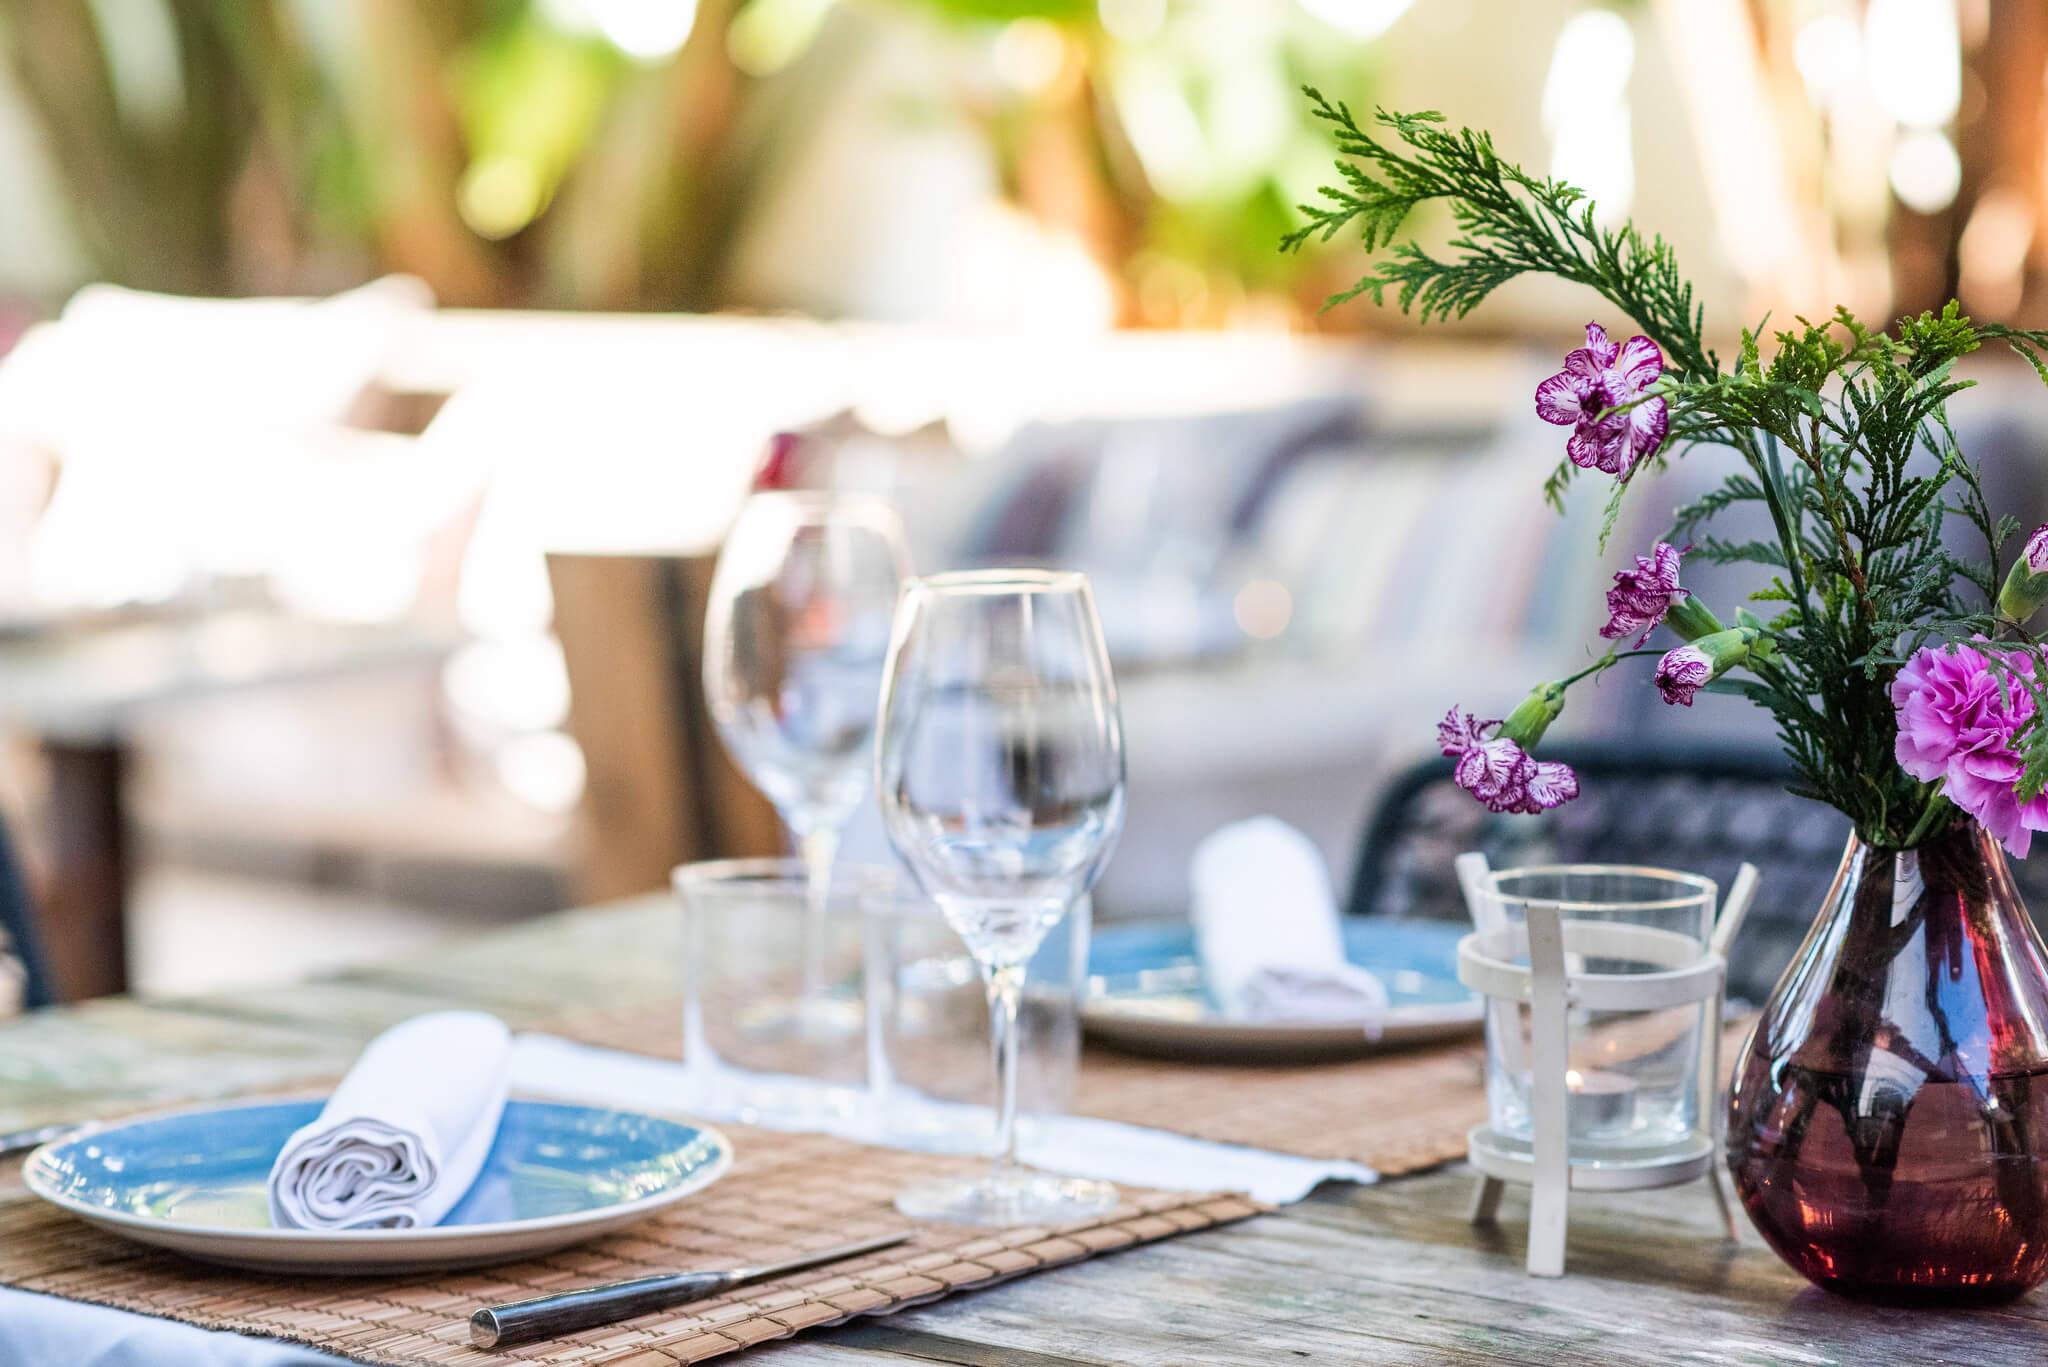 https://www.white-ibiza.com/wp-content/uploads/2020/03/ibiza-restaurants-the-giri-cafe-2020-05.jpg